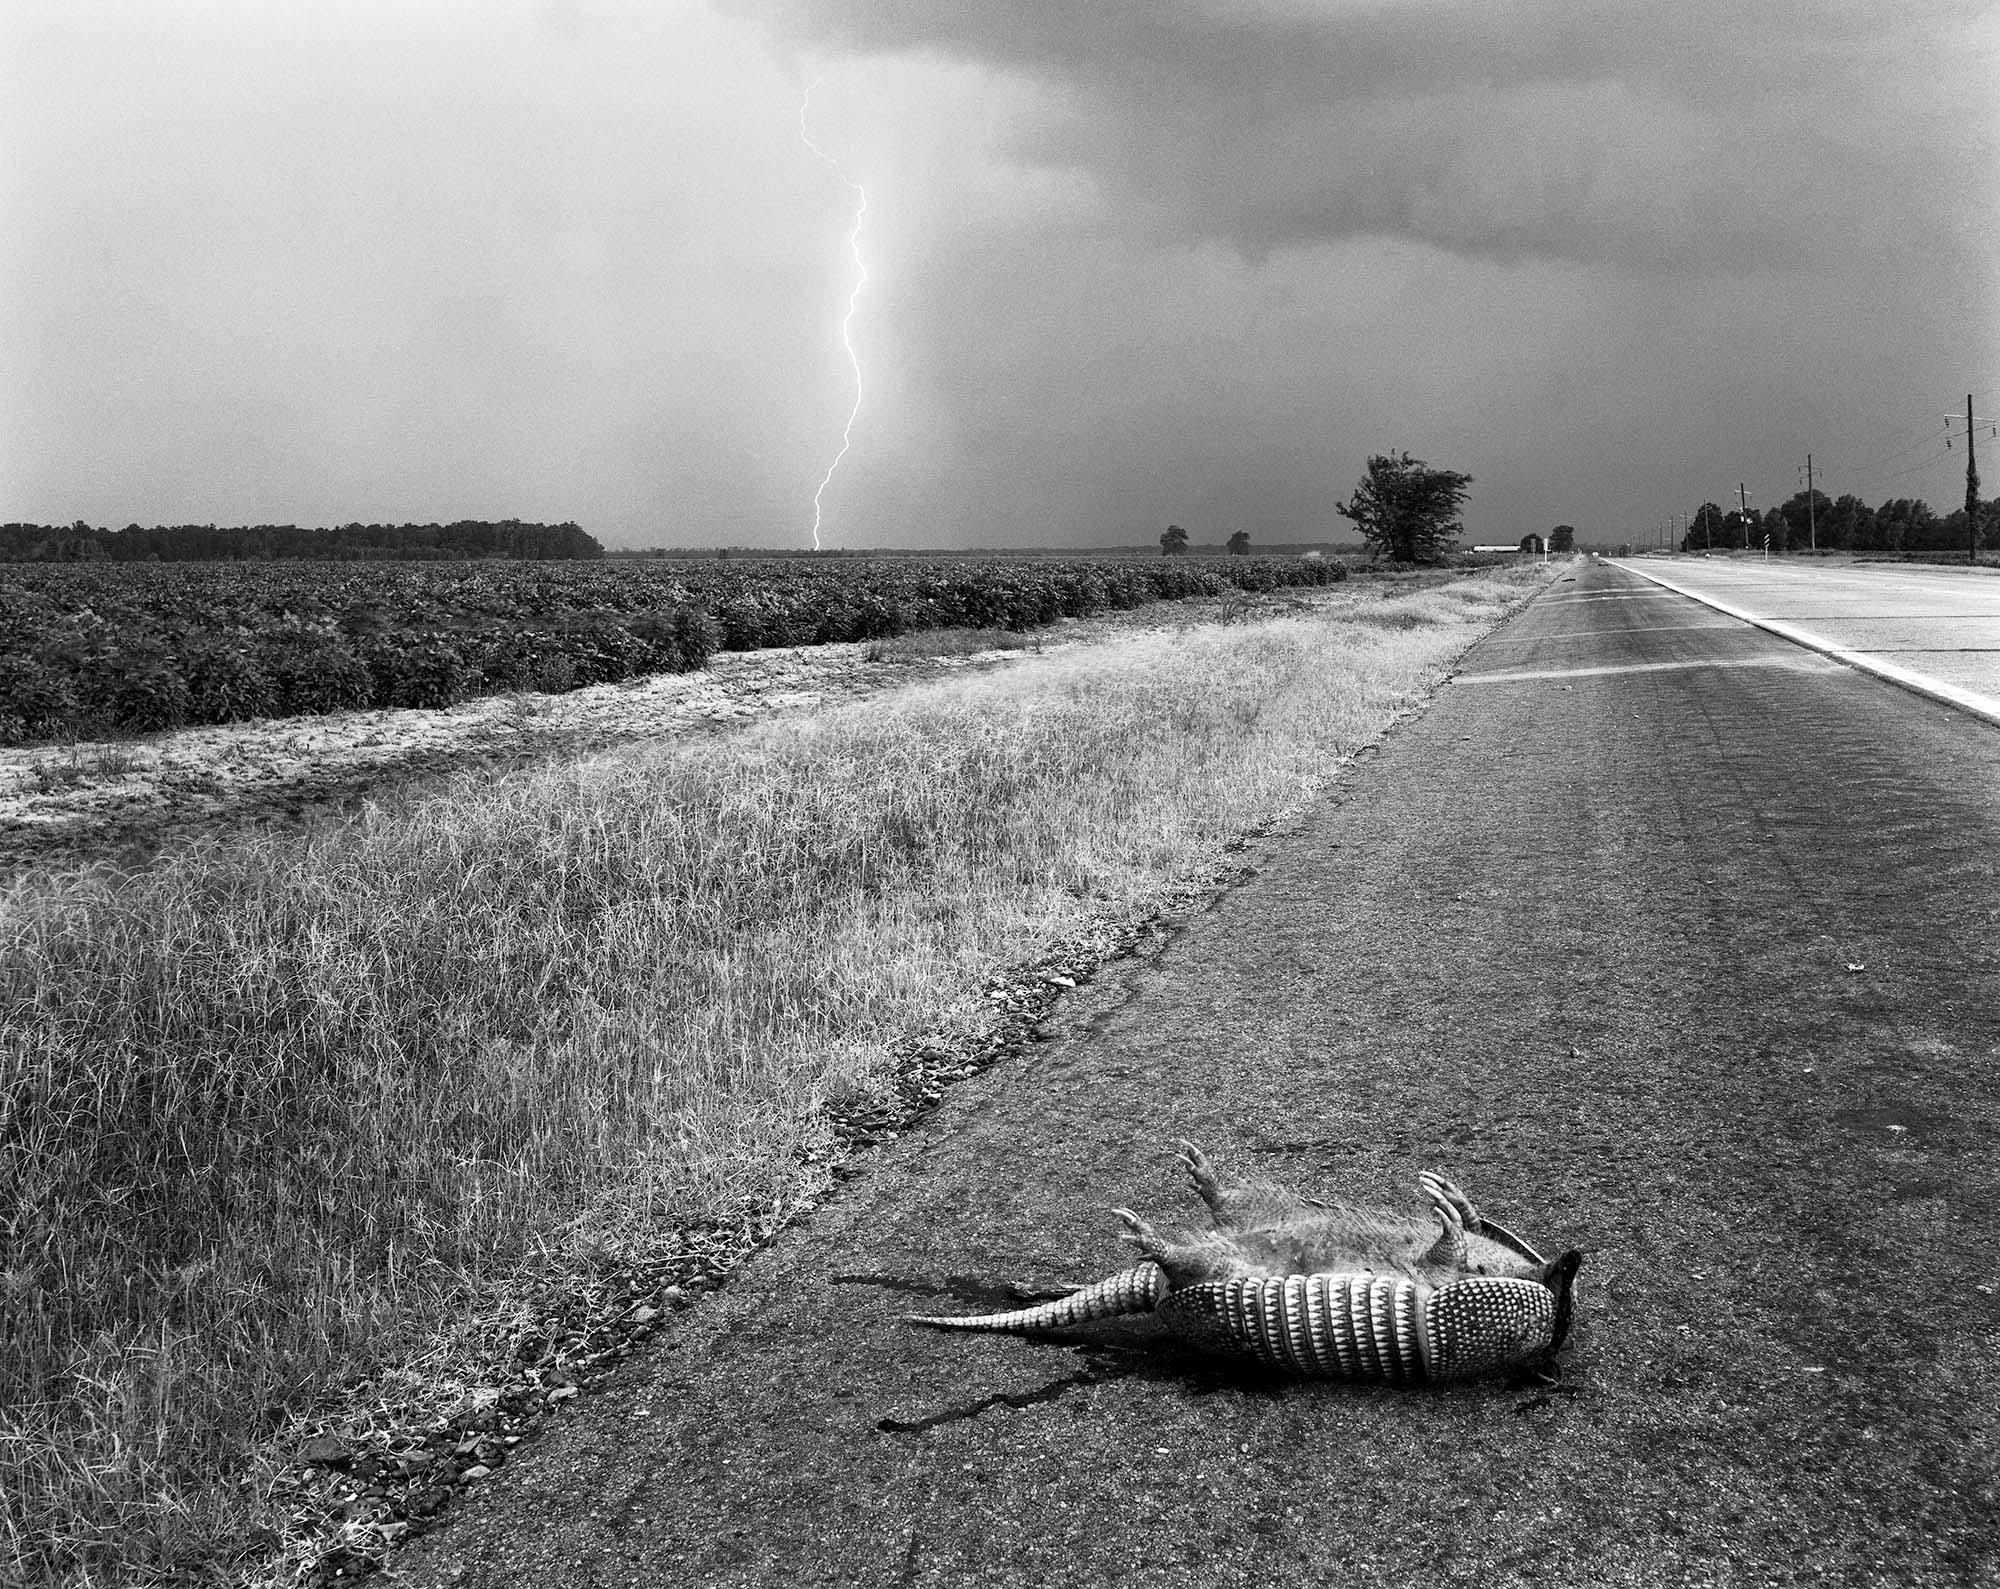 Armadillo, Waterproof., Louisiana, 1986.